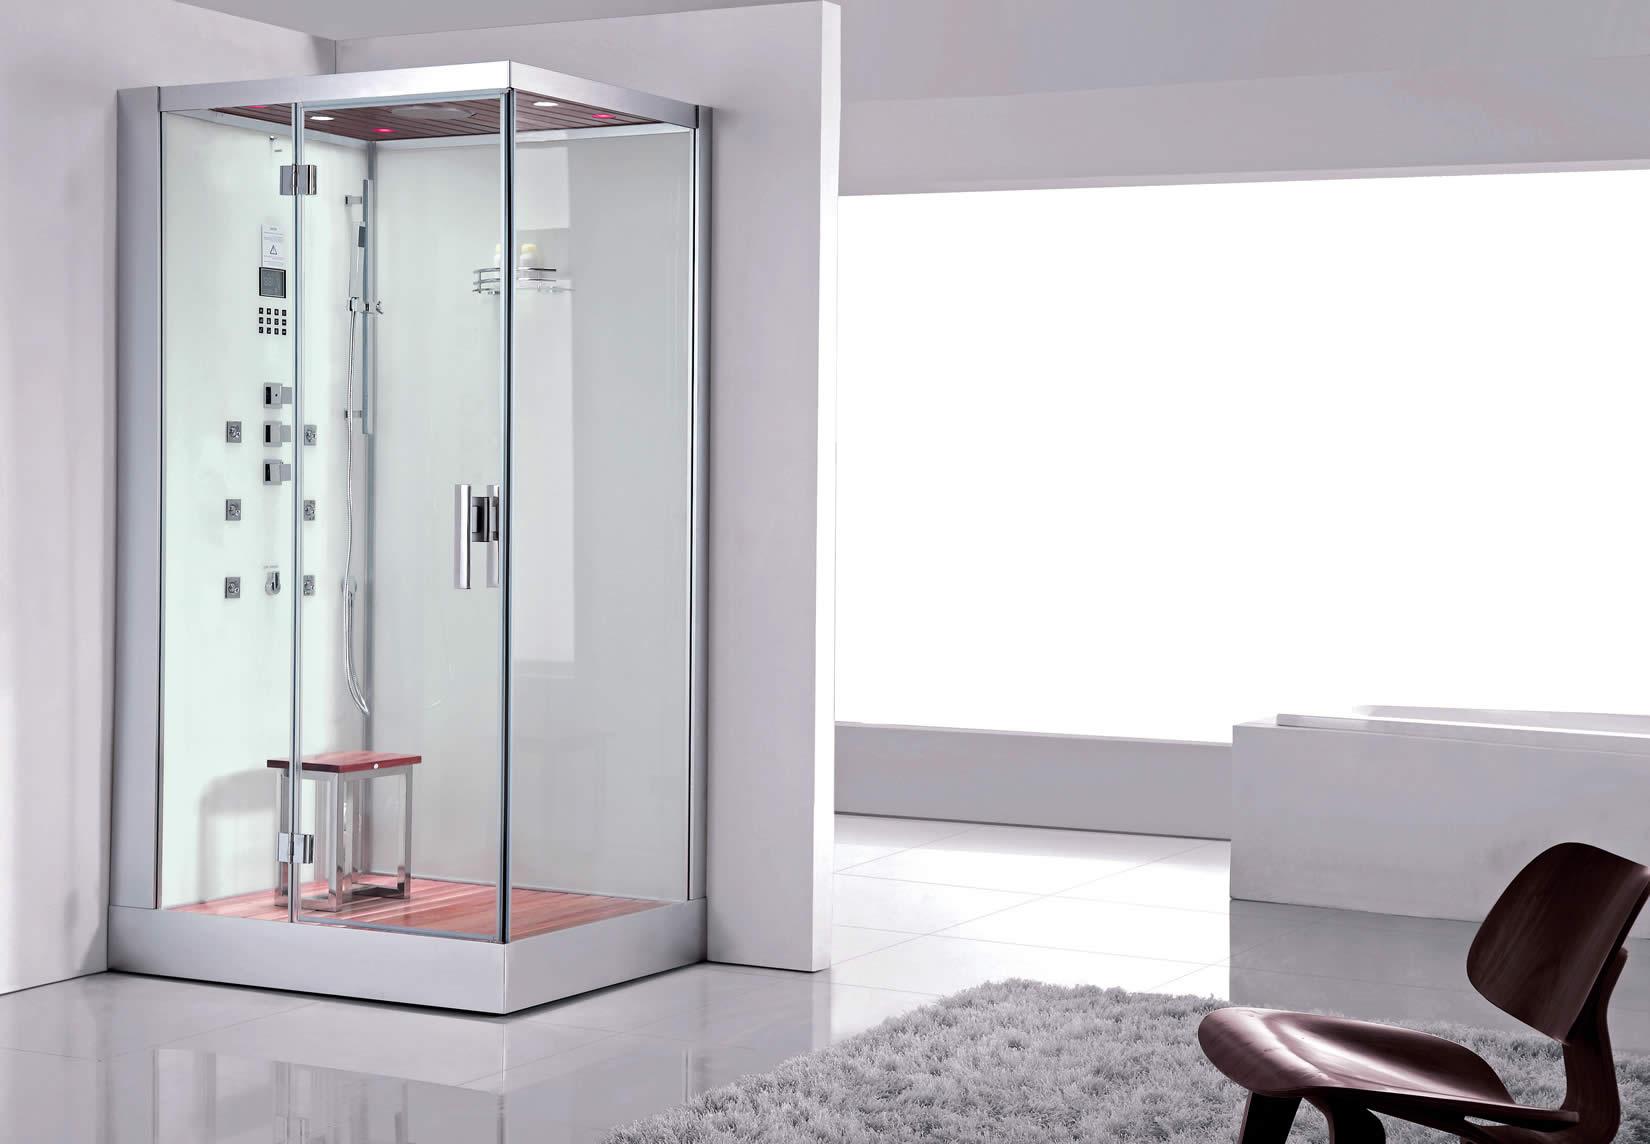 Cabine De Estetica Simples : Unique spa cabine de banho coluna de banho